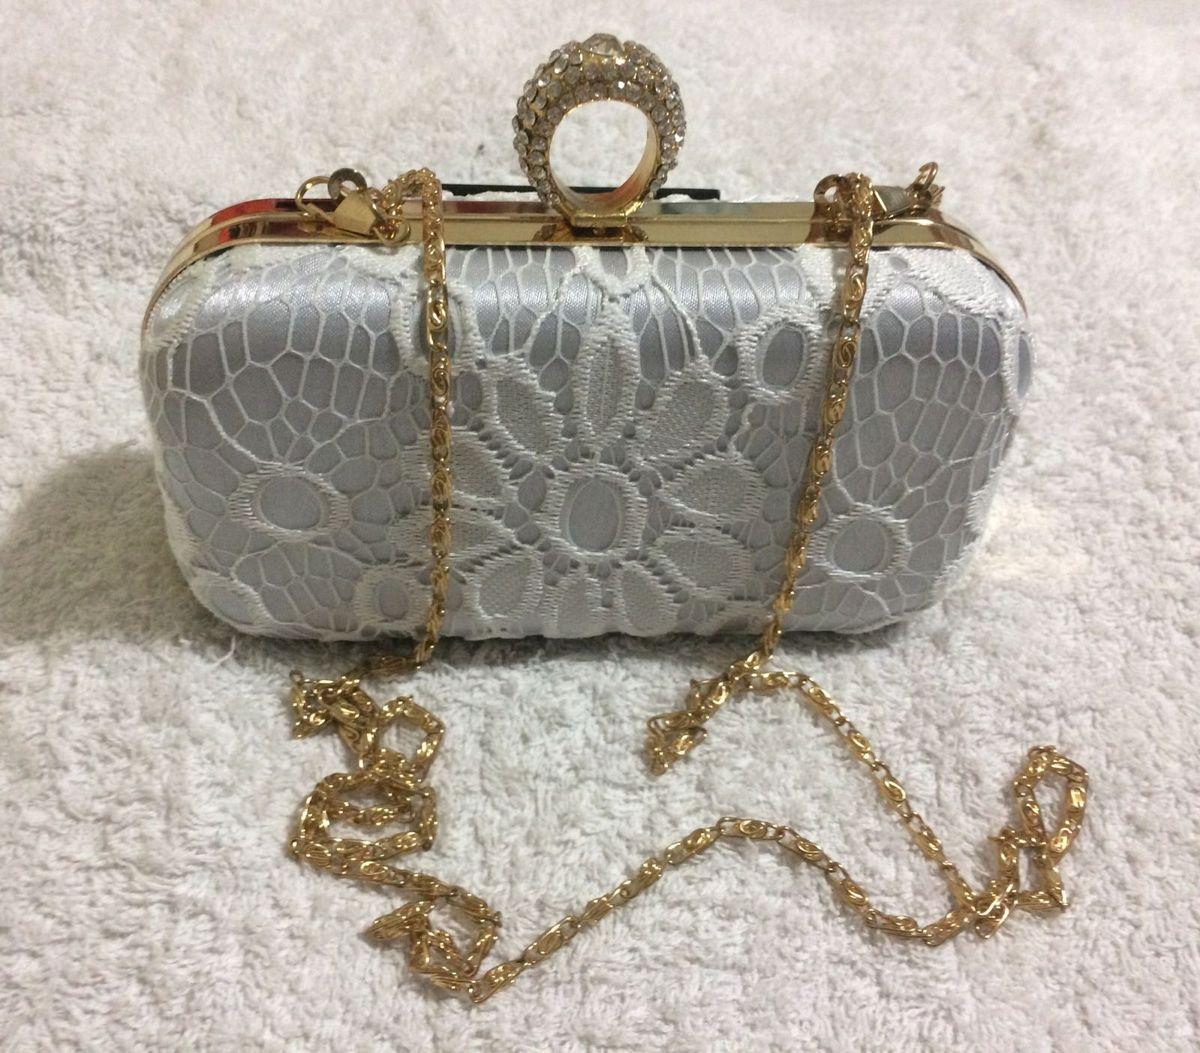 clutch bolsa de festa para em renda na cor branca - clutches sem marca 6fb2a57ef86